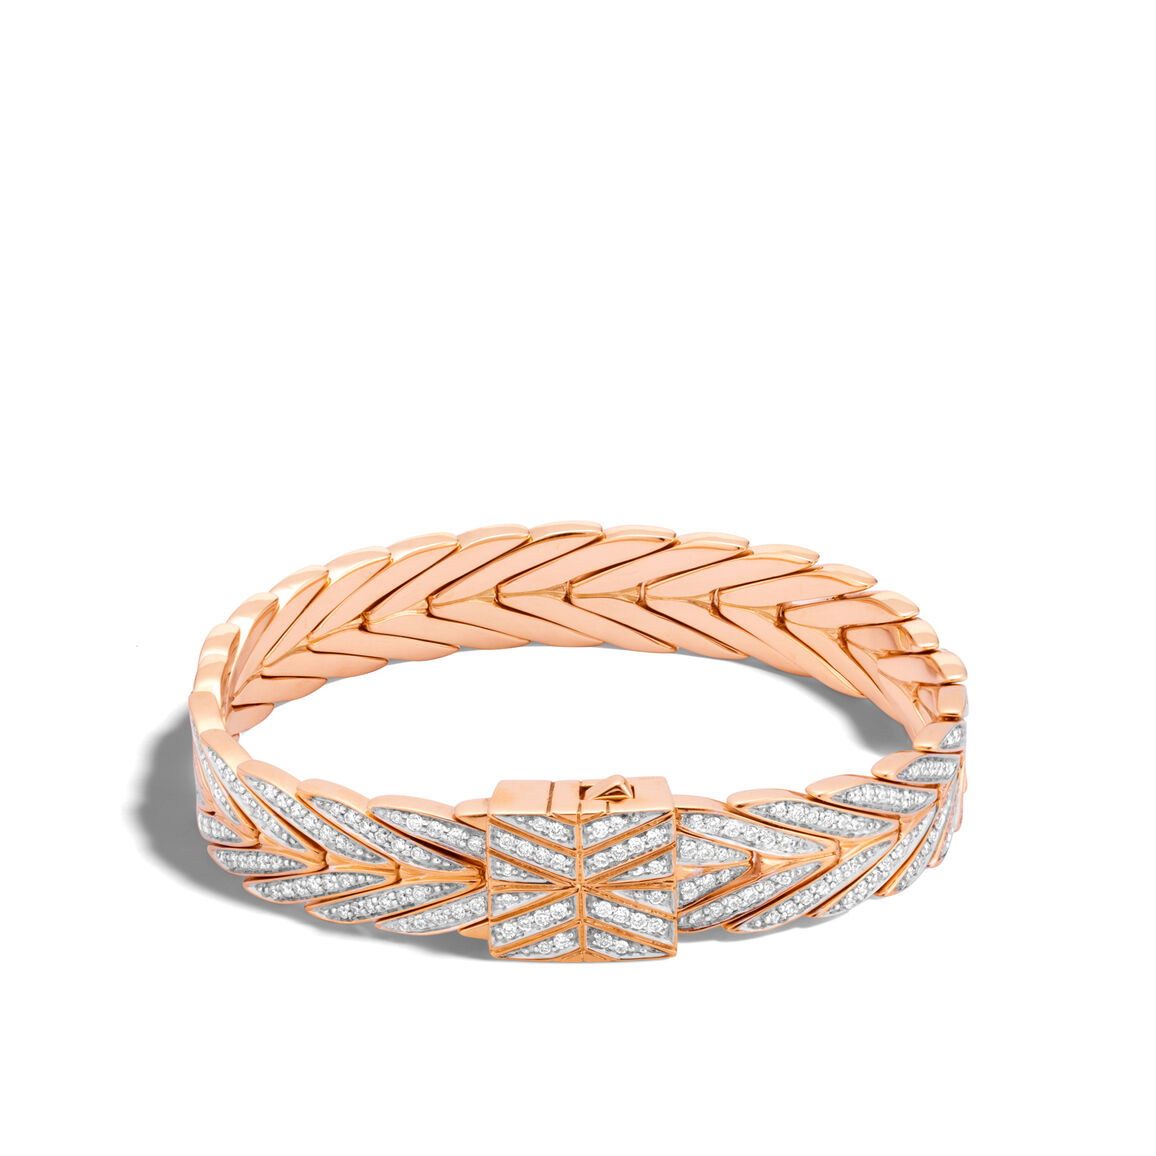 Modern Chain 11MM Bracelet in 18K Rose Gold with Diamonds